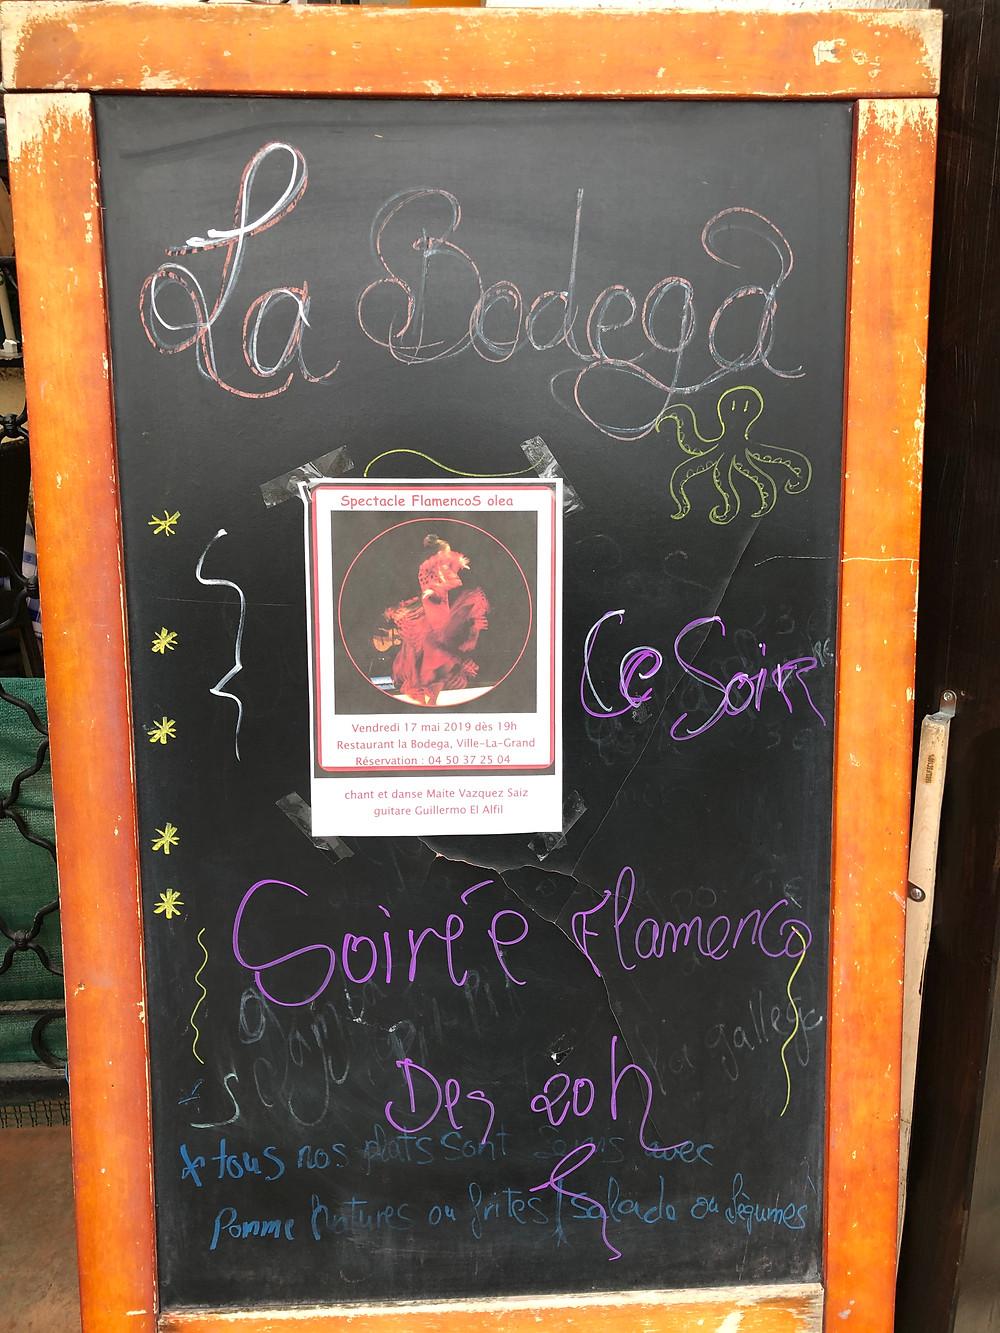 Flamenco La bodega Annemasse